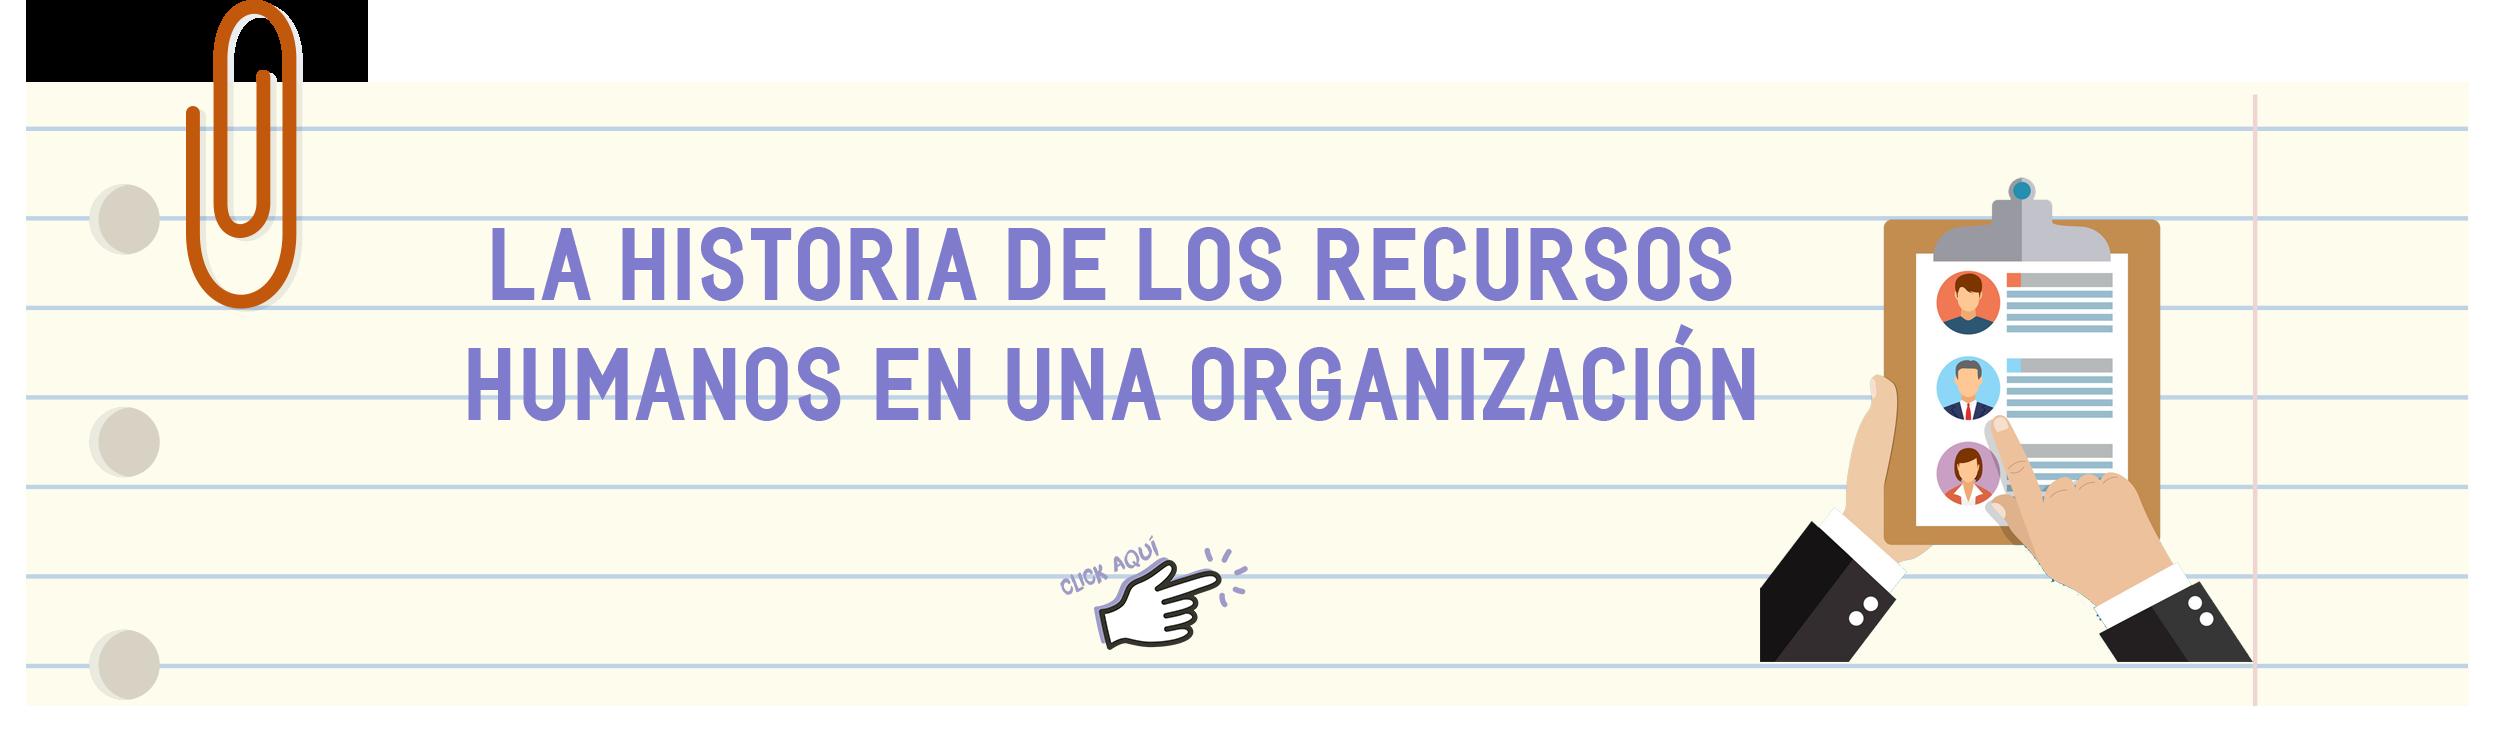 recursos_humanos.png